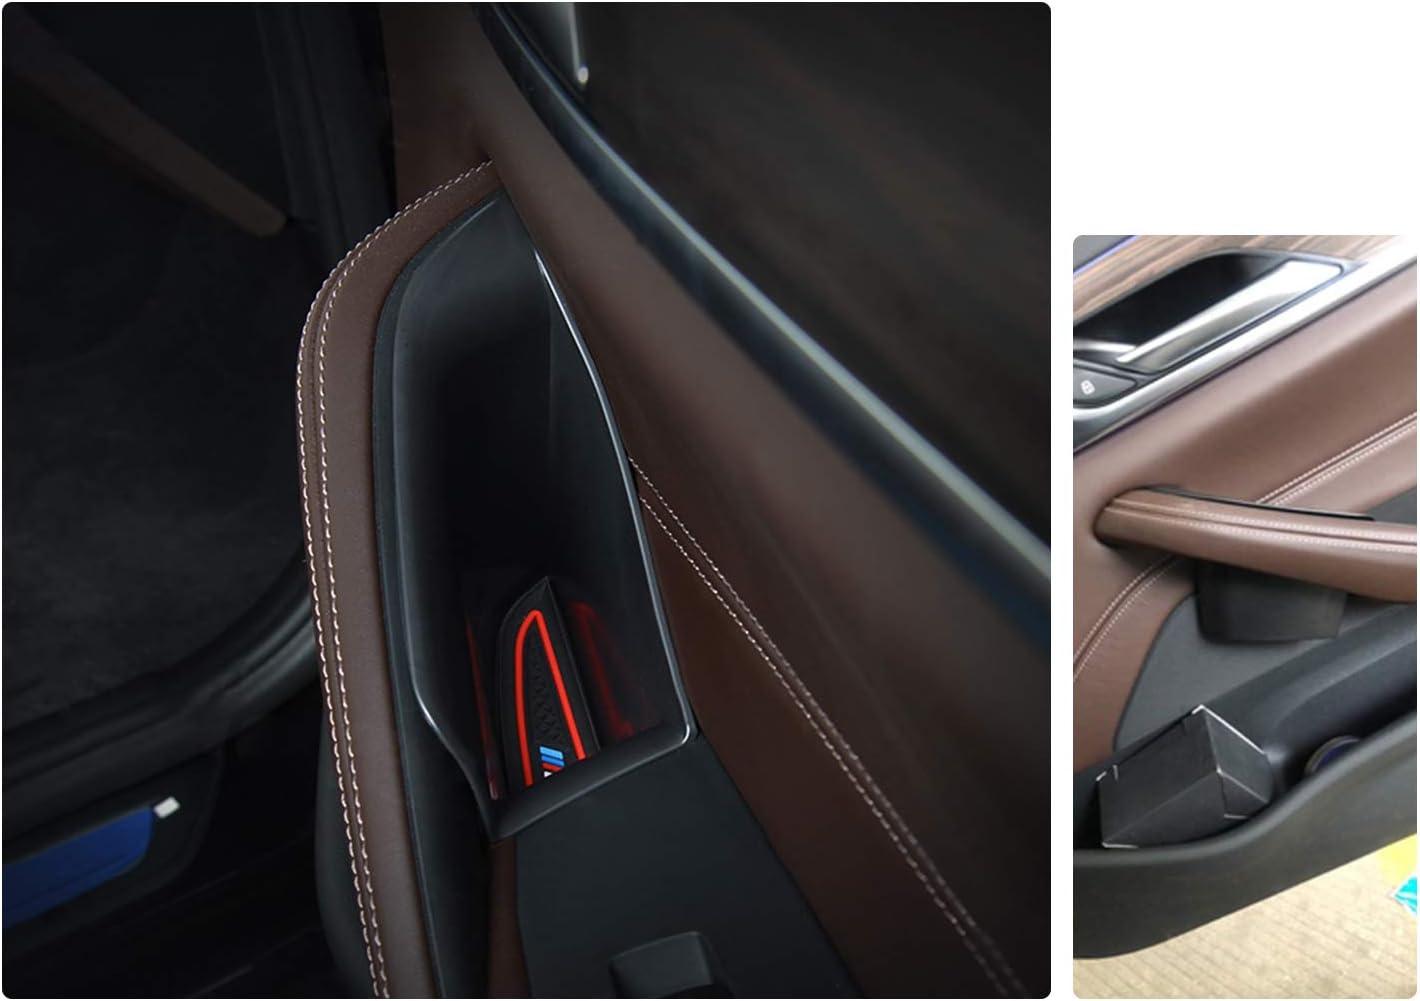 A-Premium Rear Tailgate Door Lock Actuator Compatible with BMW G30 F90 530e 530e xDrive M5 X3 2018-2019 530i 540i 2017-2019